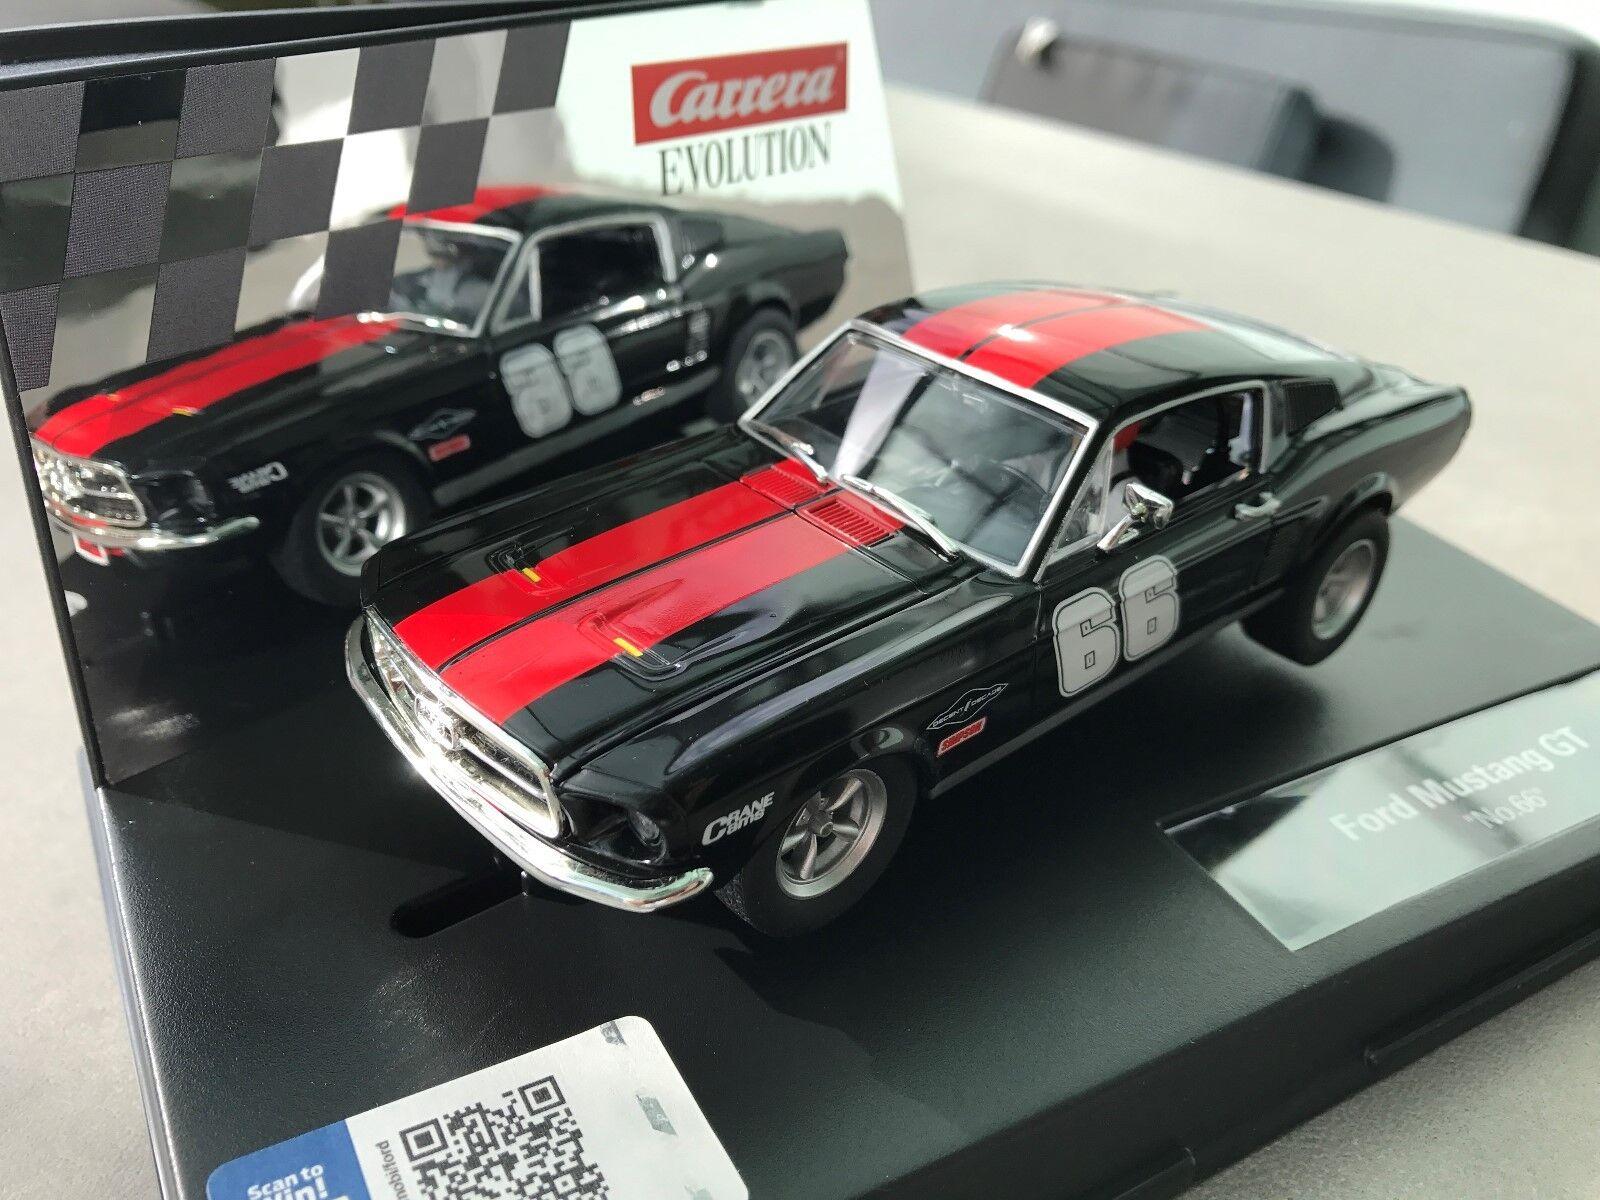 Carrera Evolution 27553 Ford Mustang GT   no.66   NIP